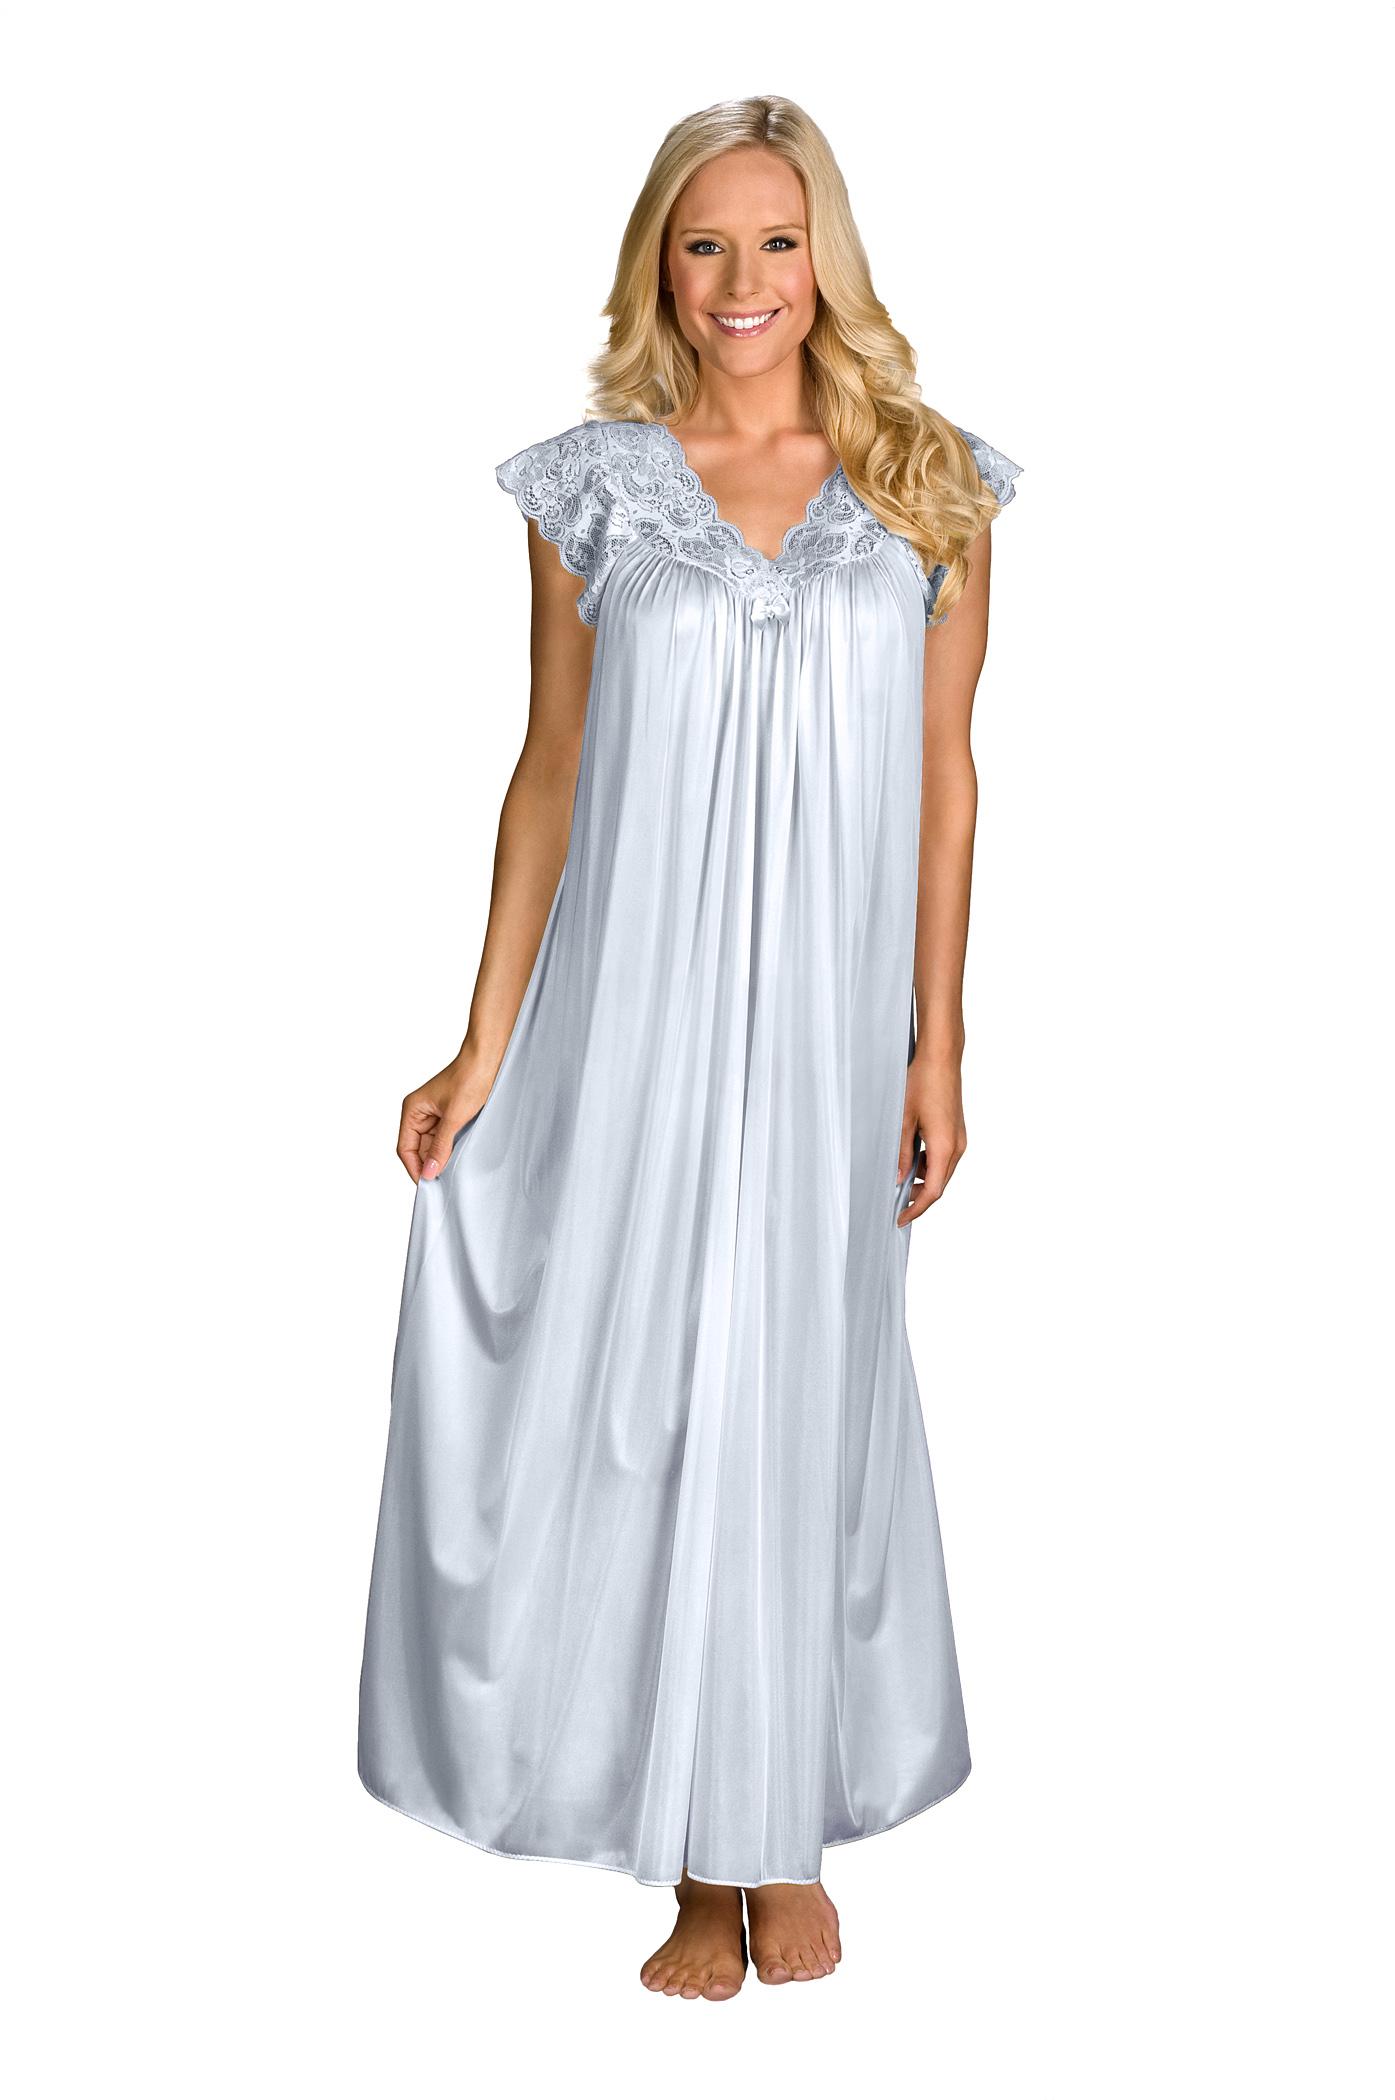 Ladies Dark Silver Grey Satin Chemise Nighty Nightshirt Size 8 10 12 14 16 18